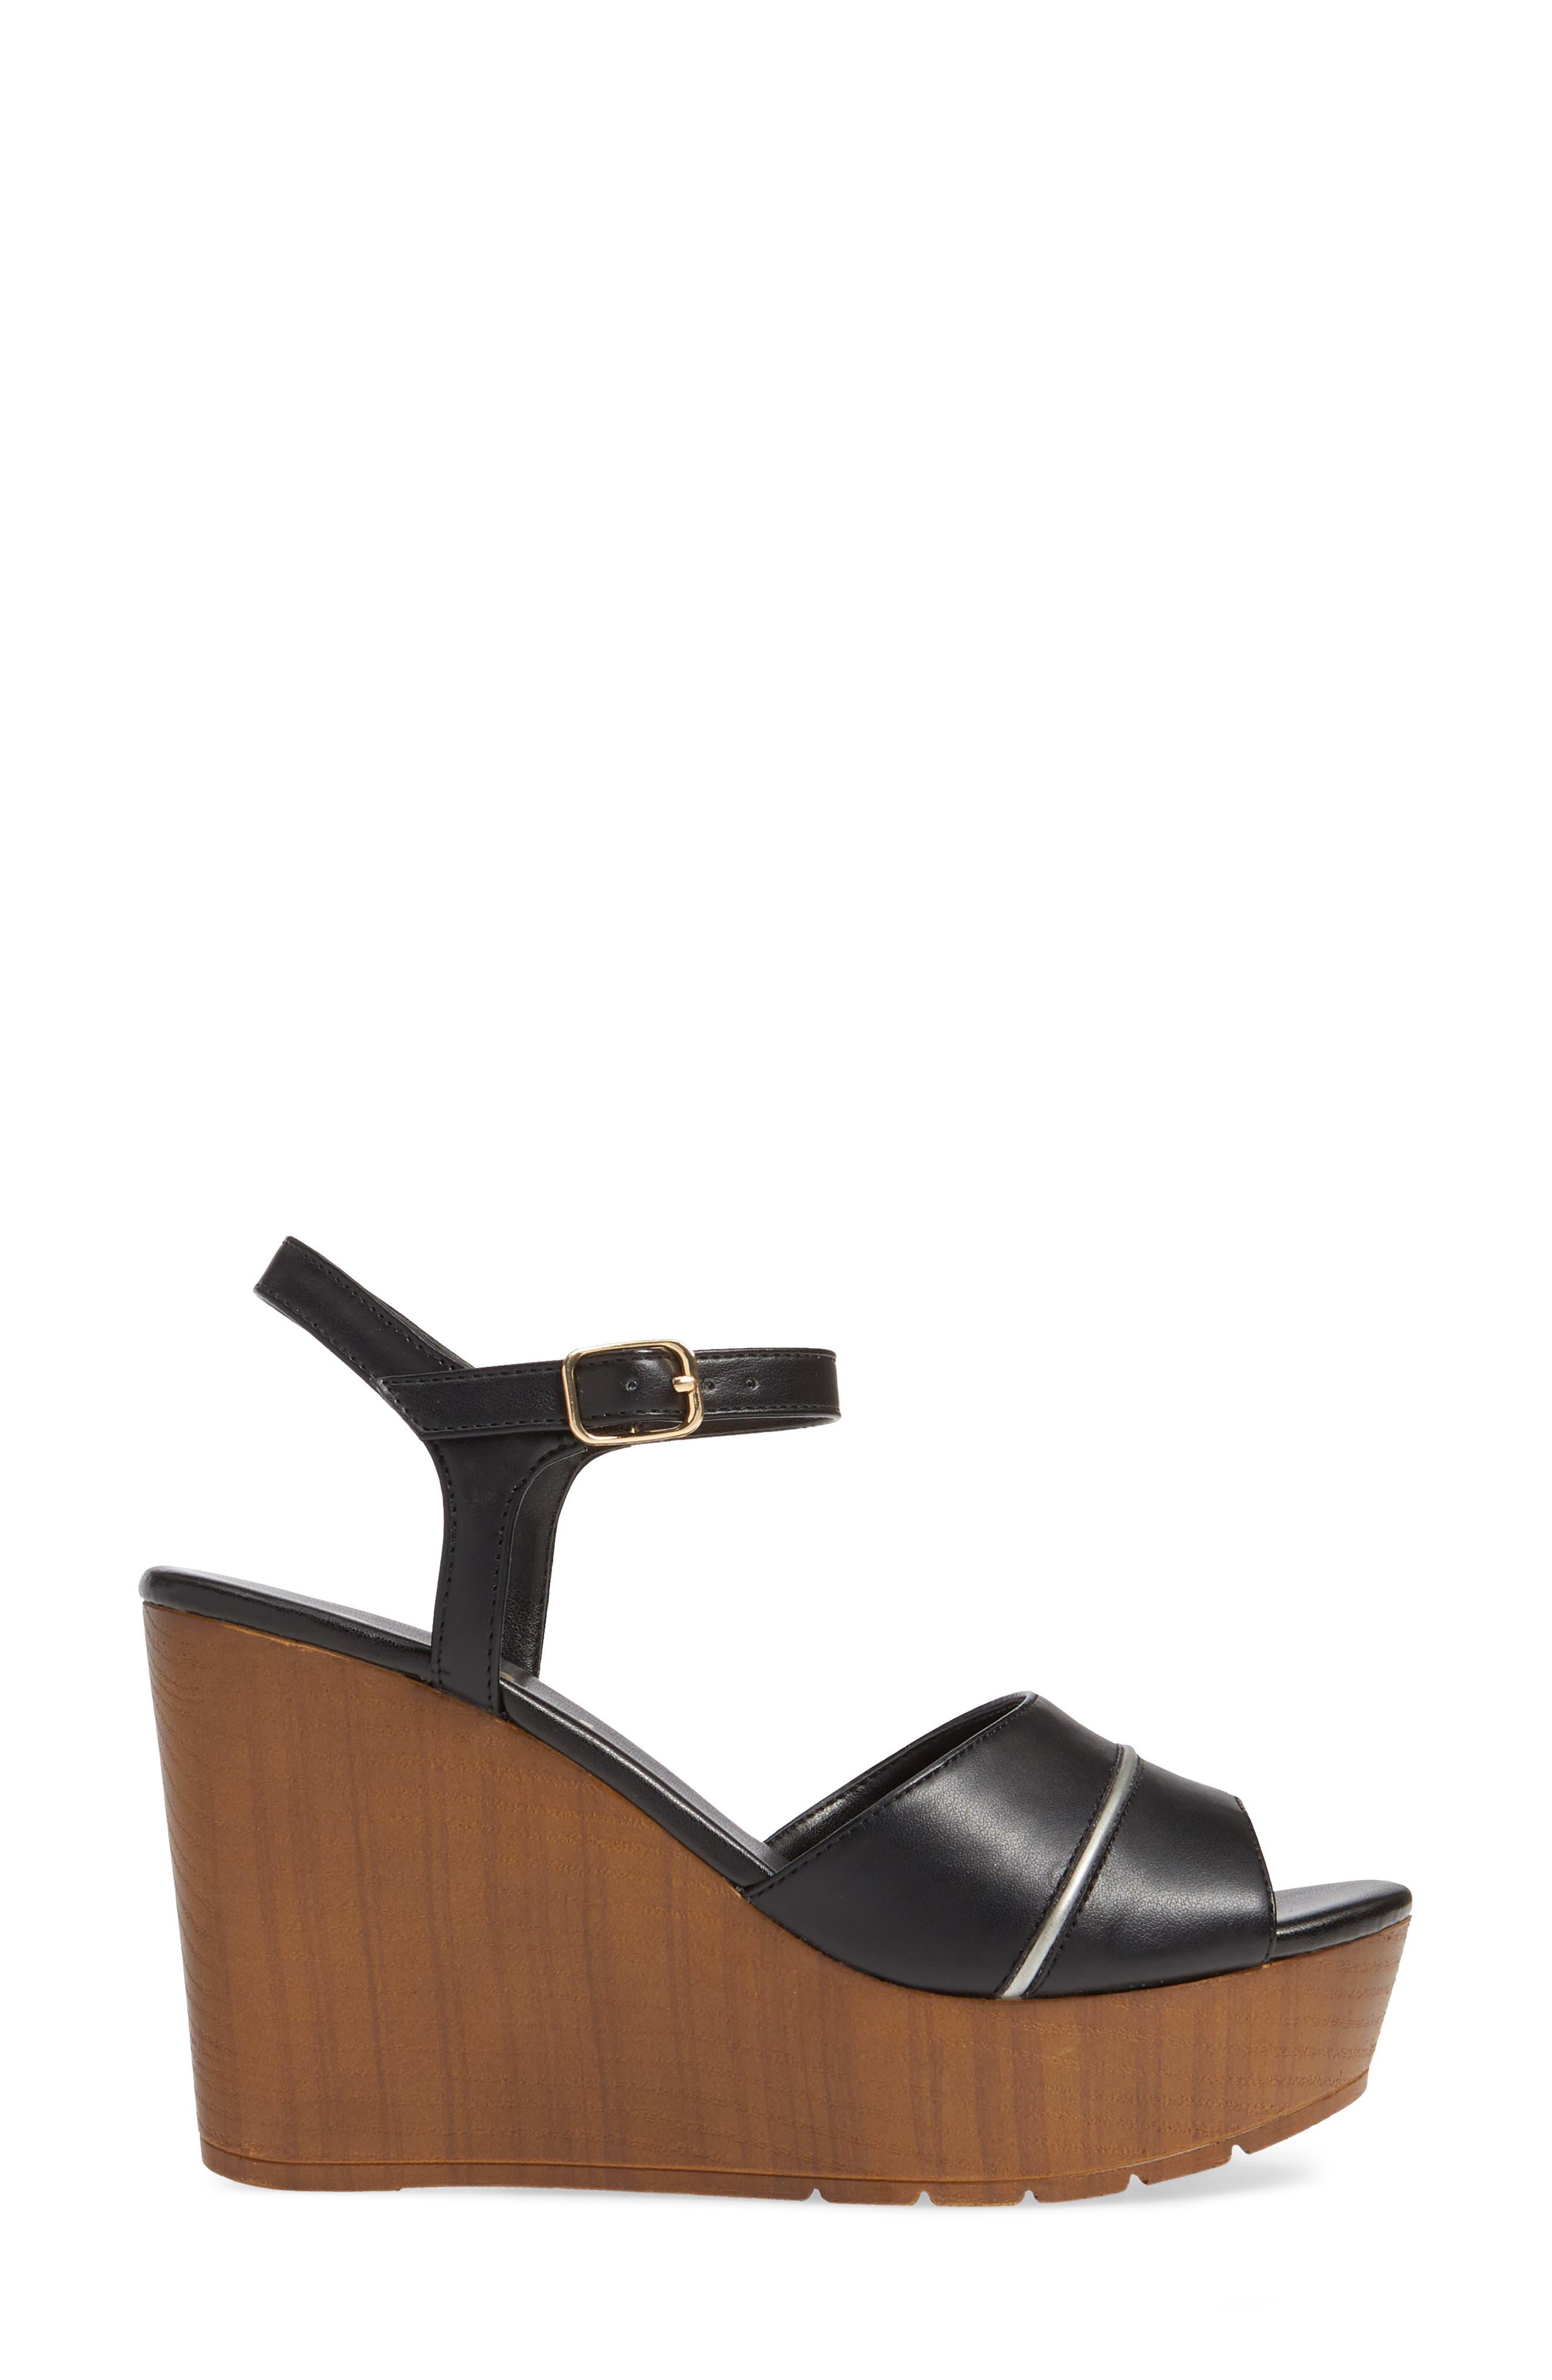 CALLISTO, Masalla Platform Wedge Sandal, Alternate thumbnail 3, color, BLACK FAUX LEATHER